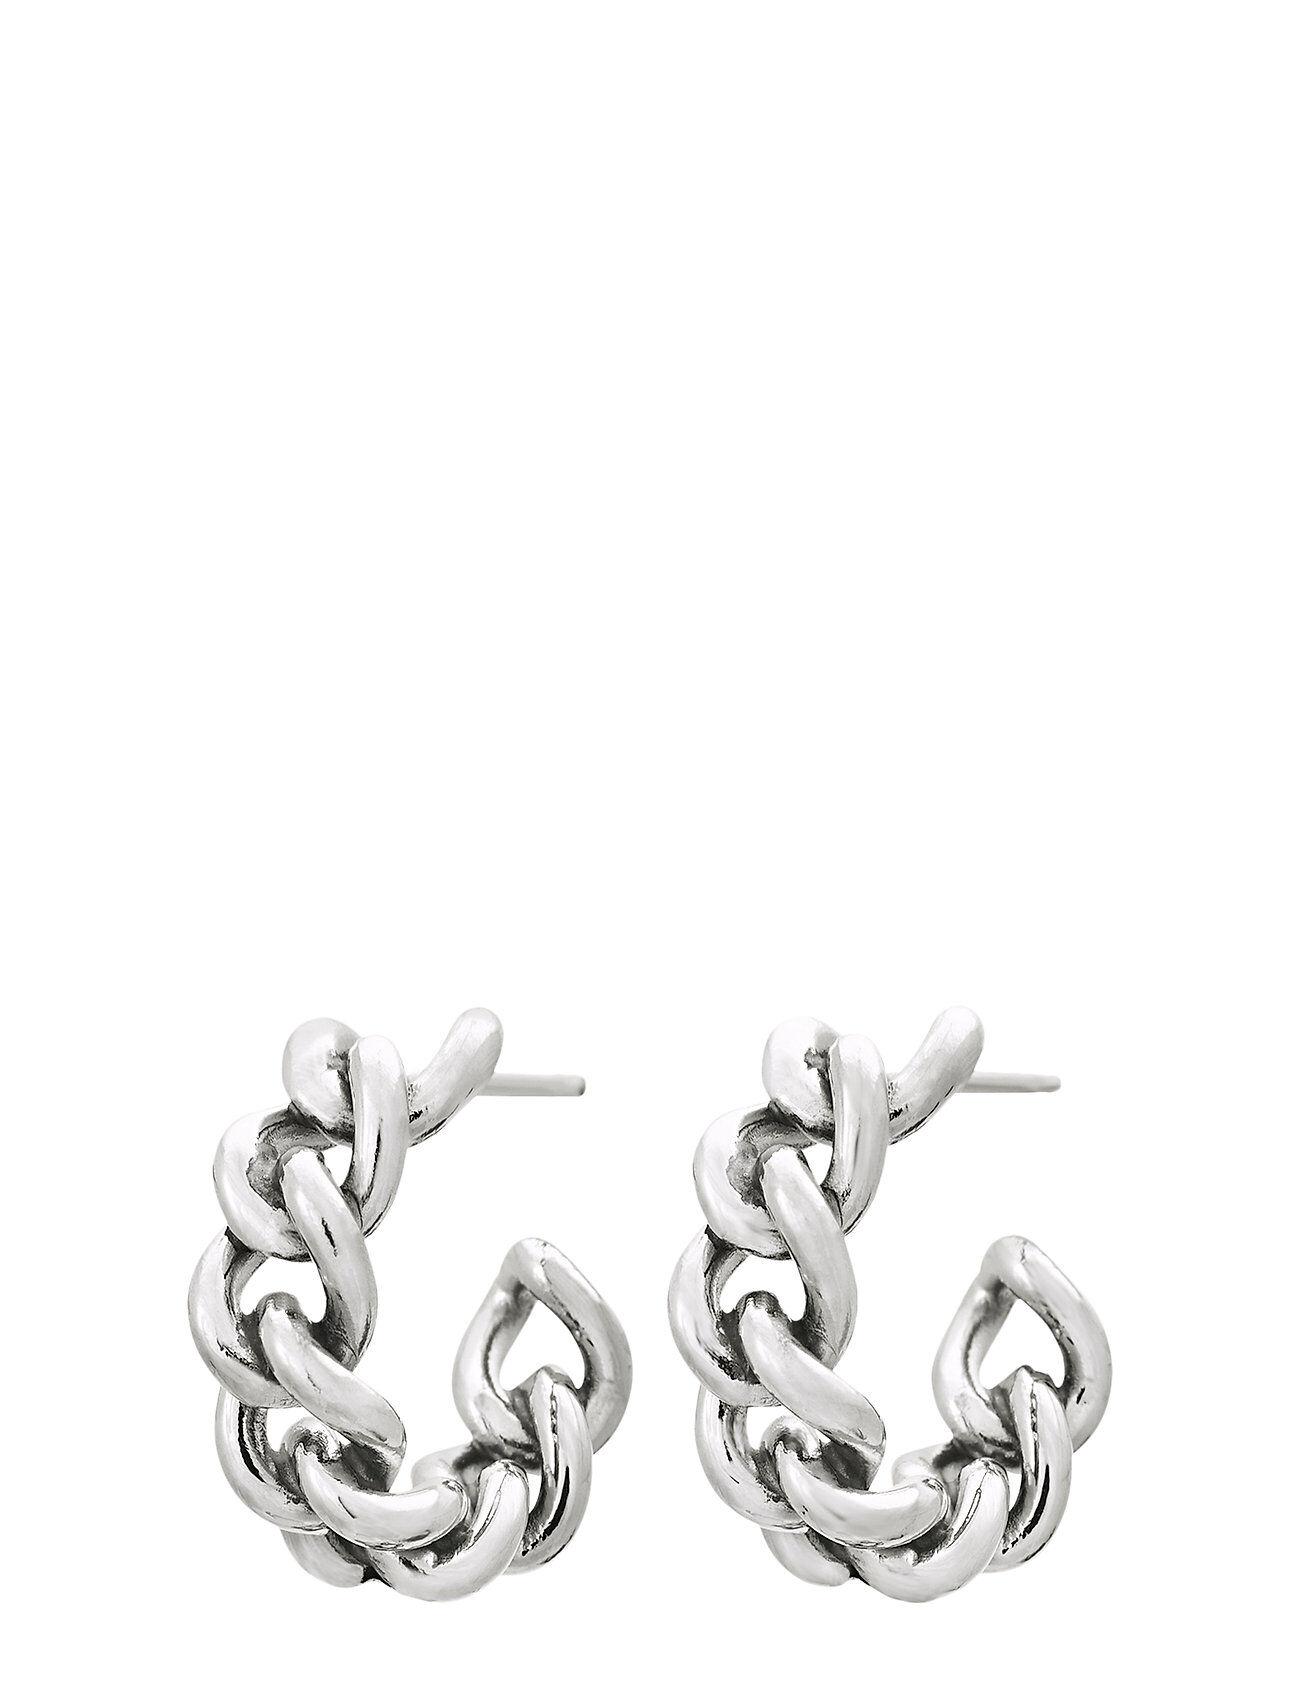 Edblad Lourdes Chain Creole Accessories Jewellery Earrings Hoops Hopea Edblad